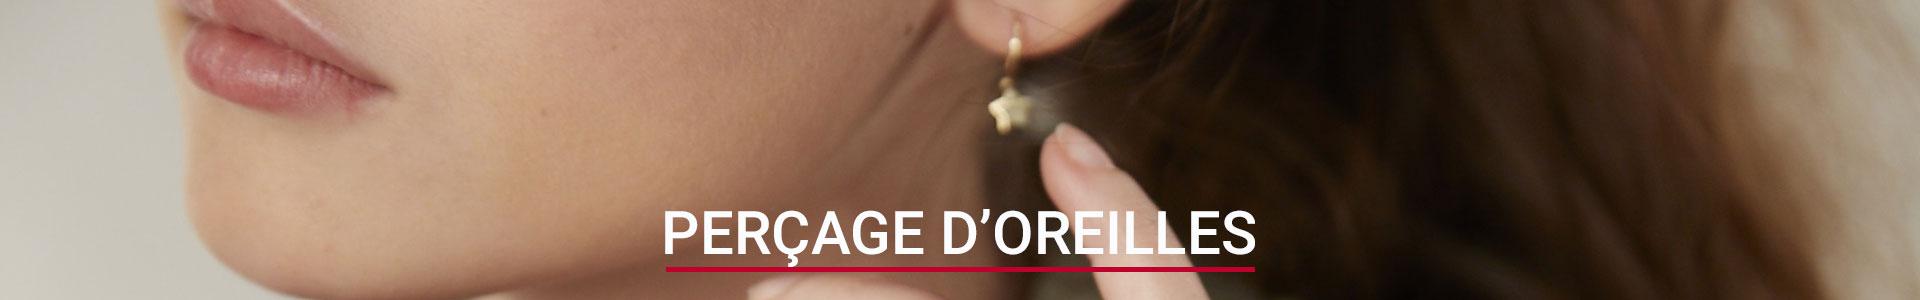 Perçage d'oreilles